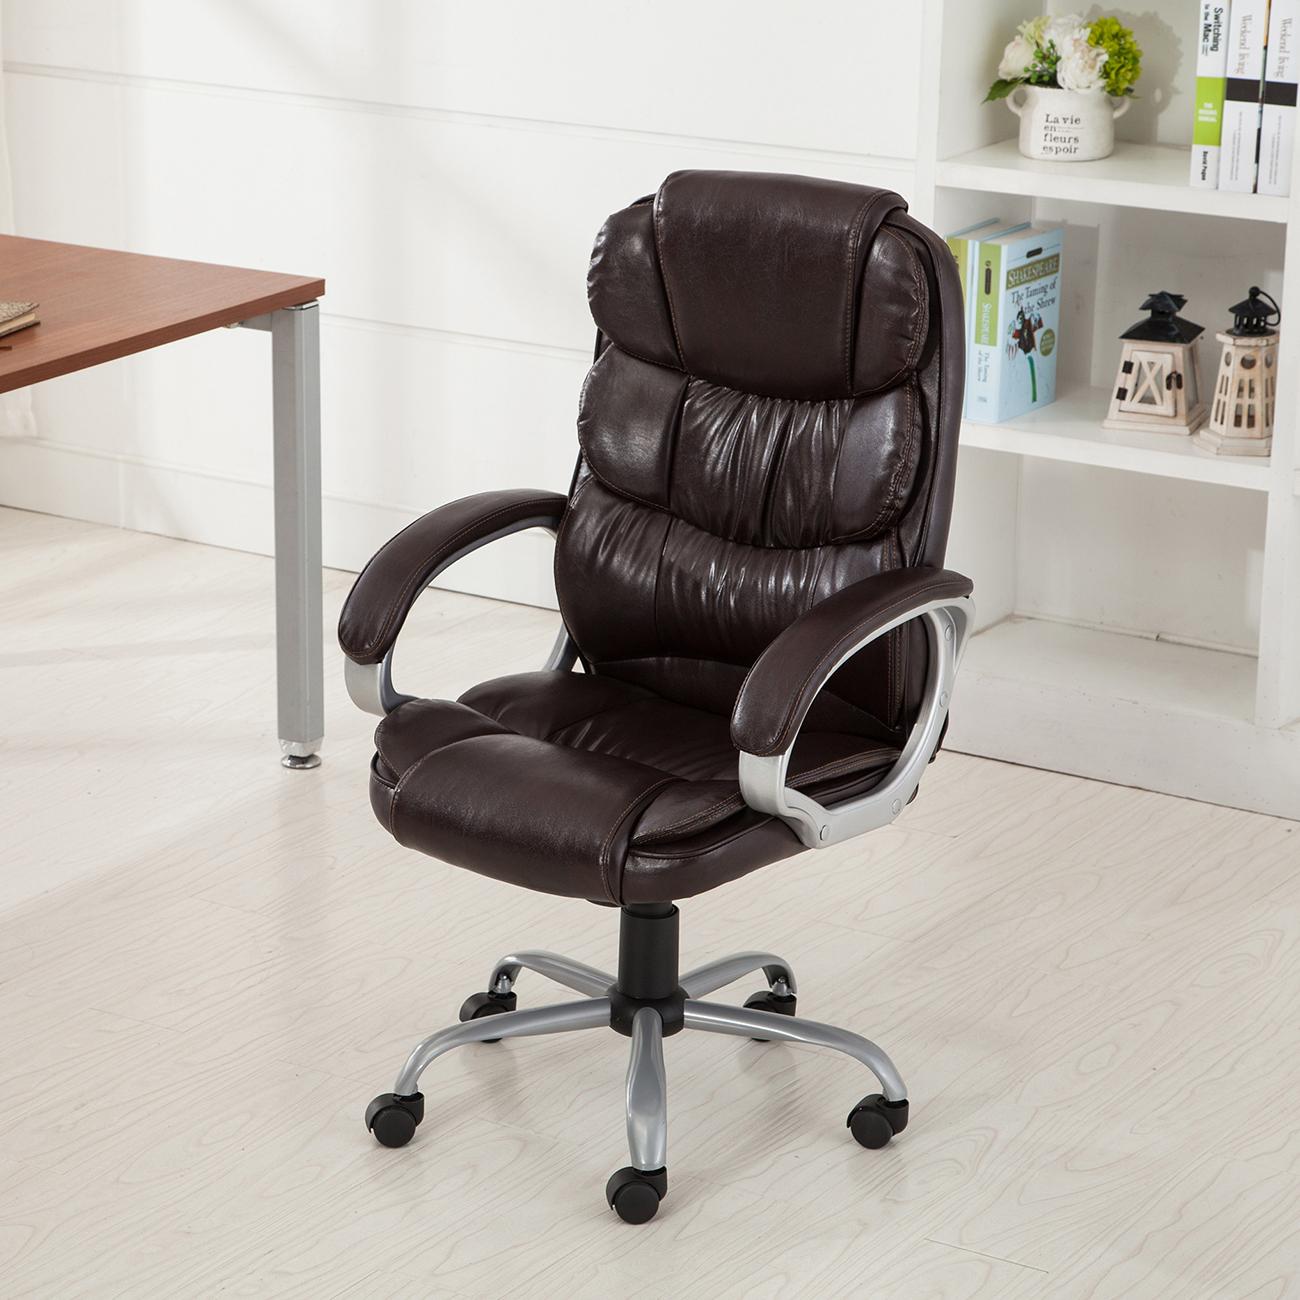 PU Leather Office Rolling Computer Chair Black Mocha High Back Executive Desk  eBay